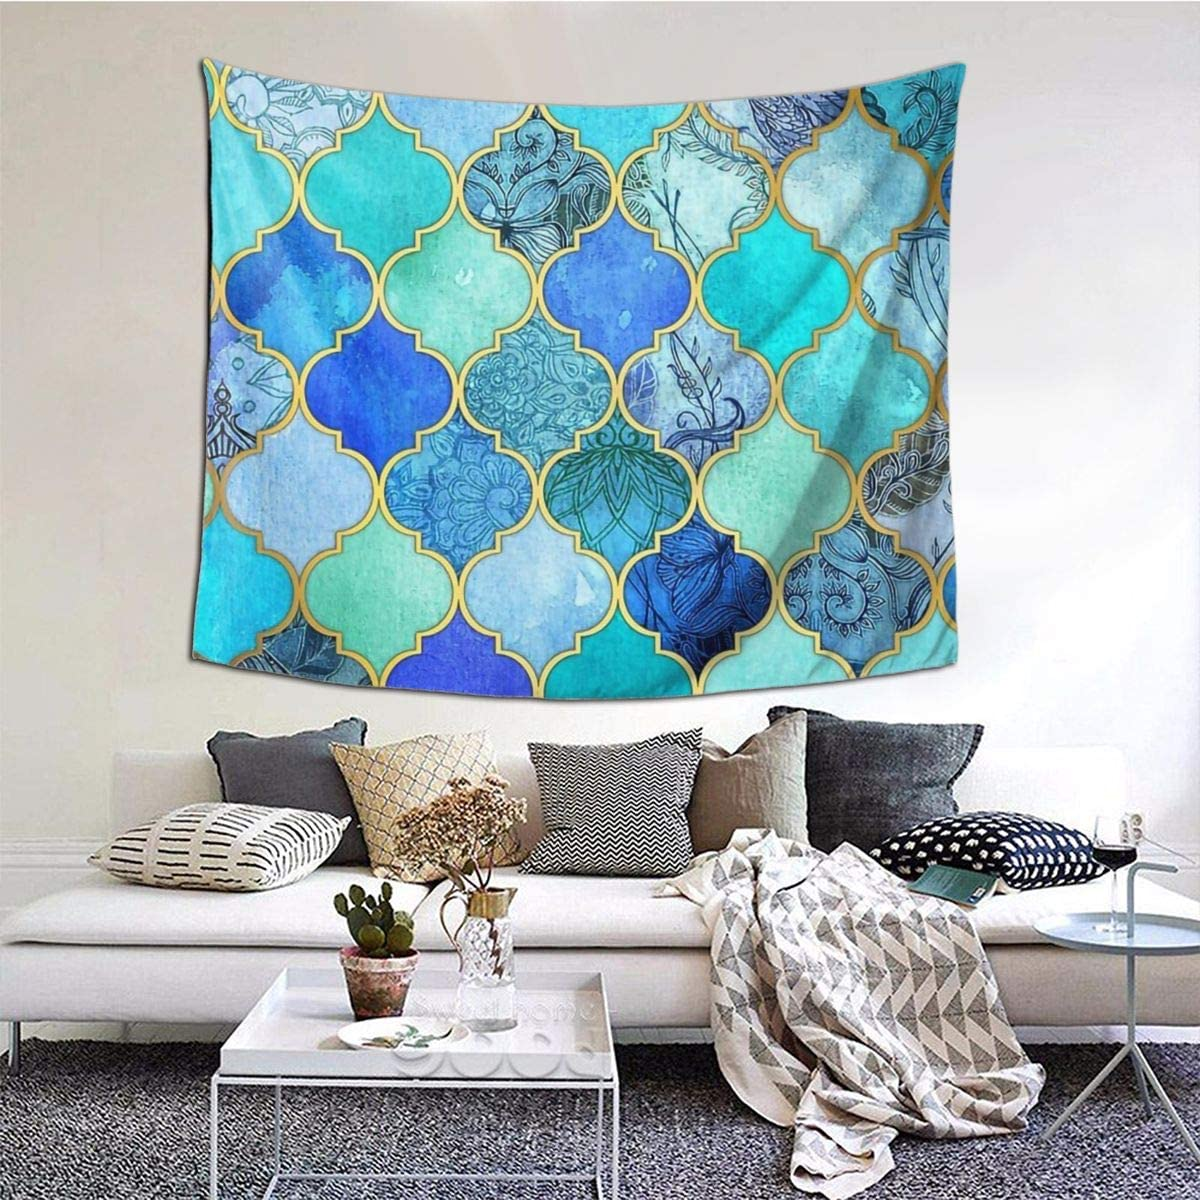 Amazon Com Newhe Cobalt Blue Aqua Gold Decorative Moroccan Wall Hanging Tapestries Decor For Living Room Bedroom Dorm Room 60 X 51 Inches Home Kitchen